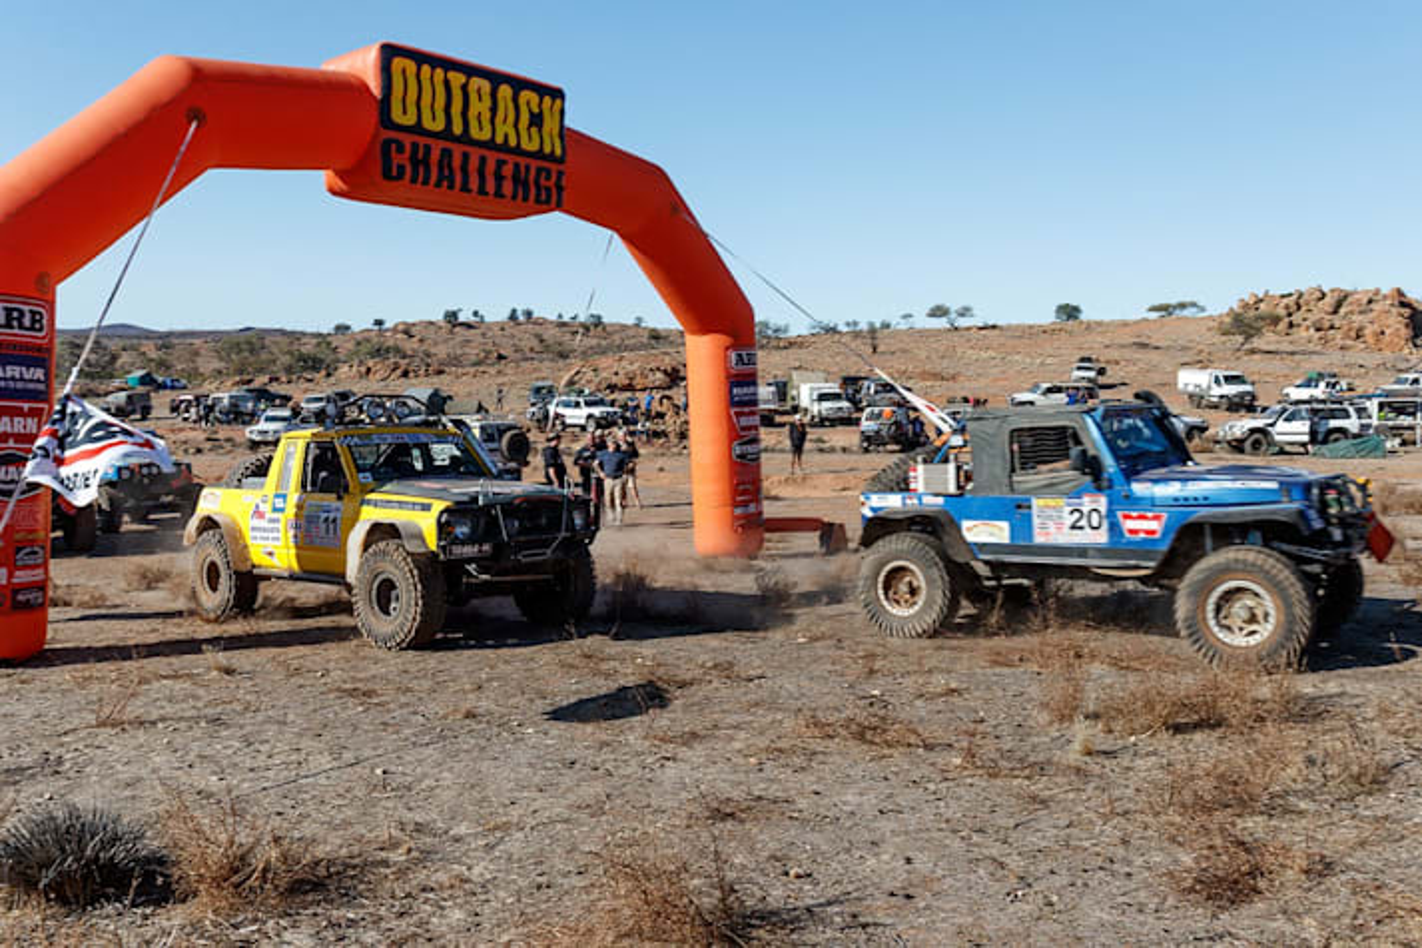 2017 Outback Challenge start line